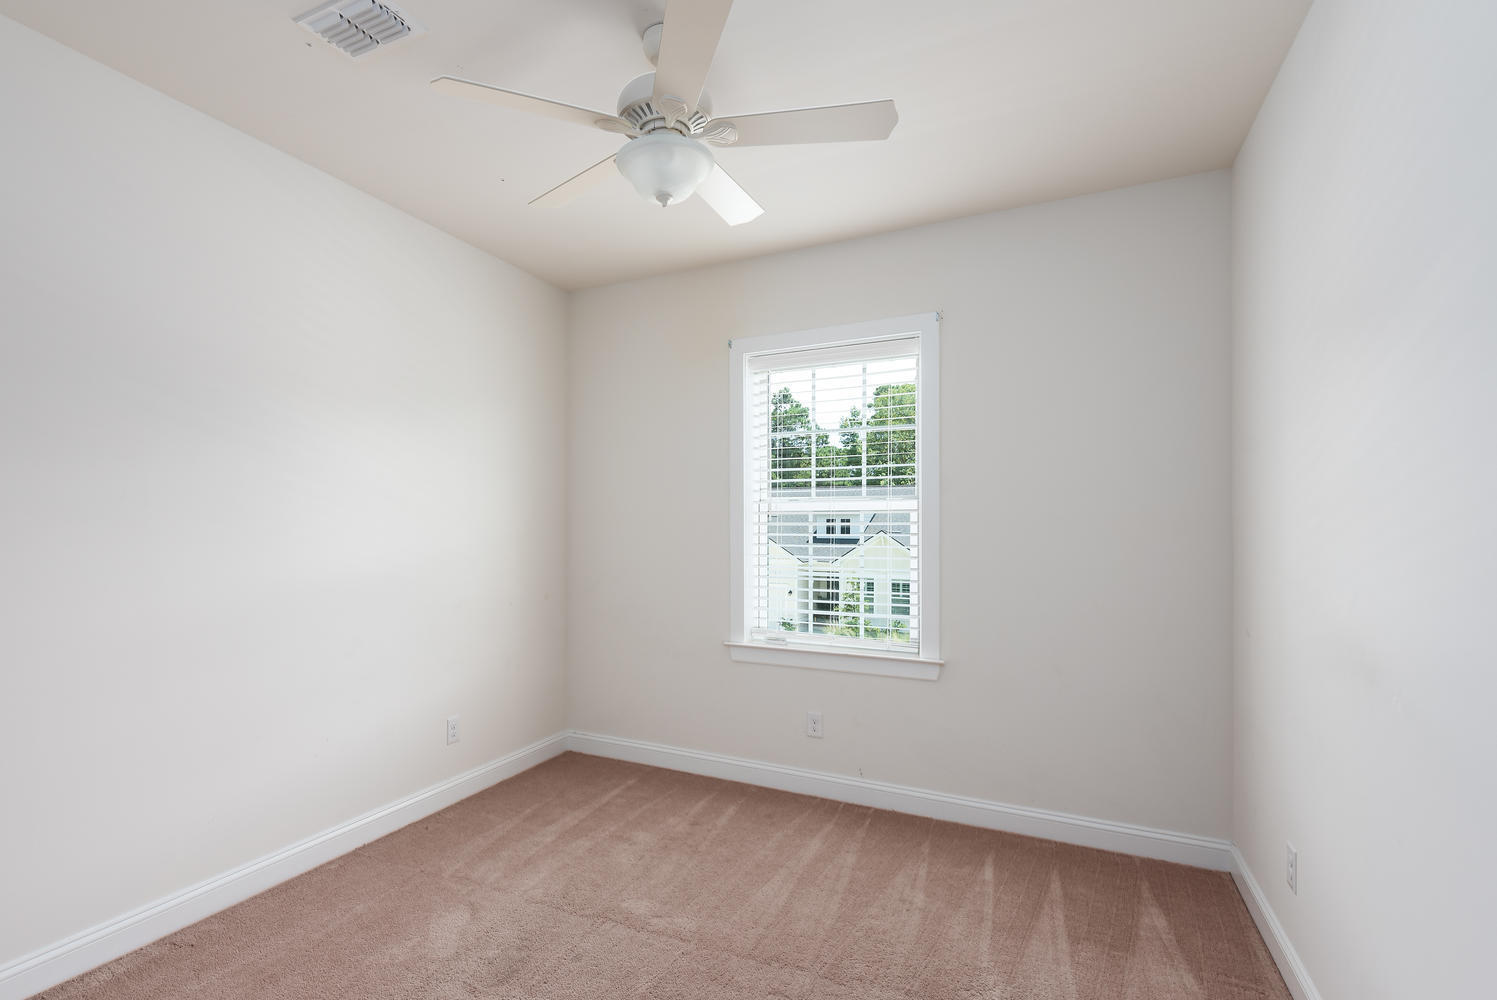 Magnolia Village Homes For Sale - 2244 Spring Hope, Mount Pleasant, SC - 17